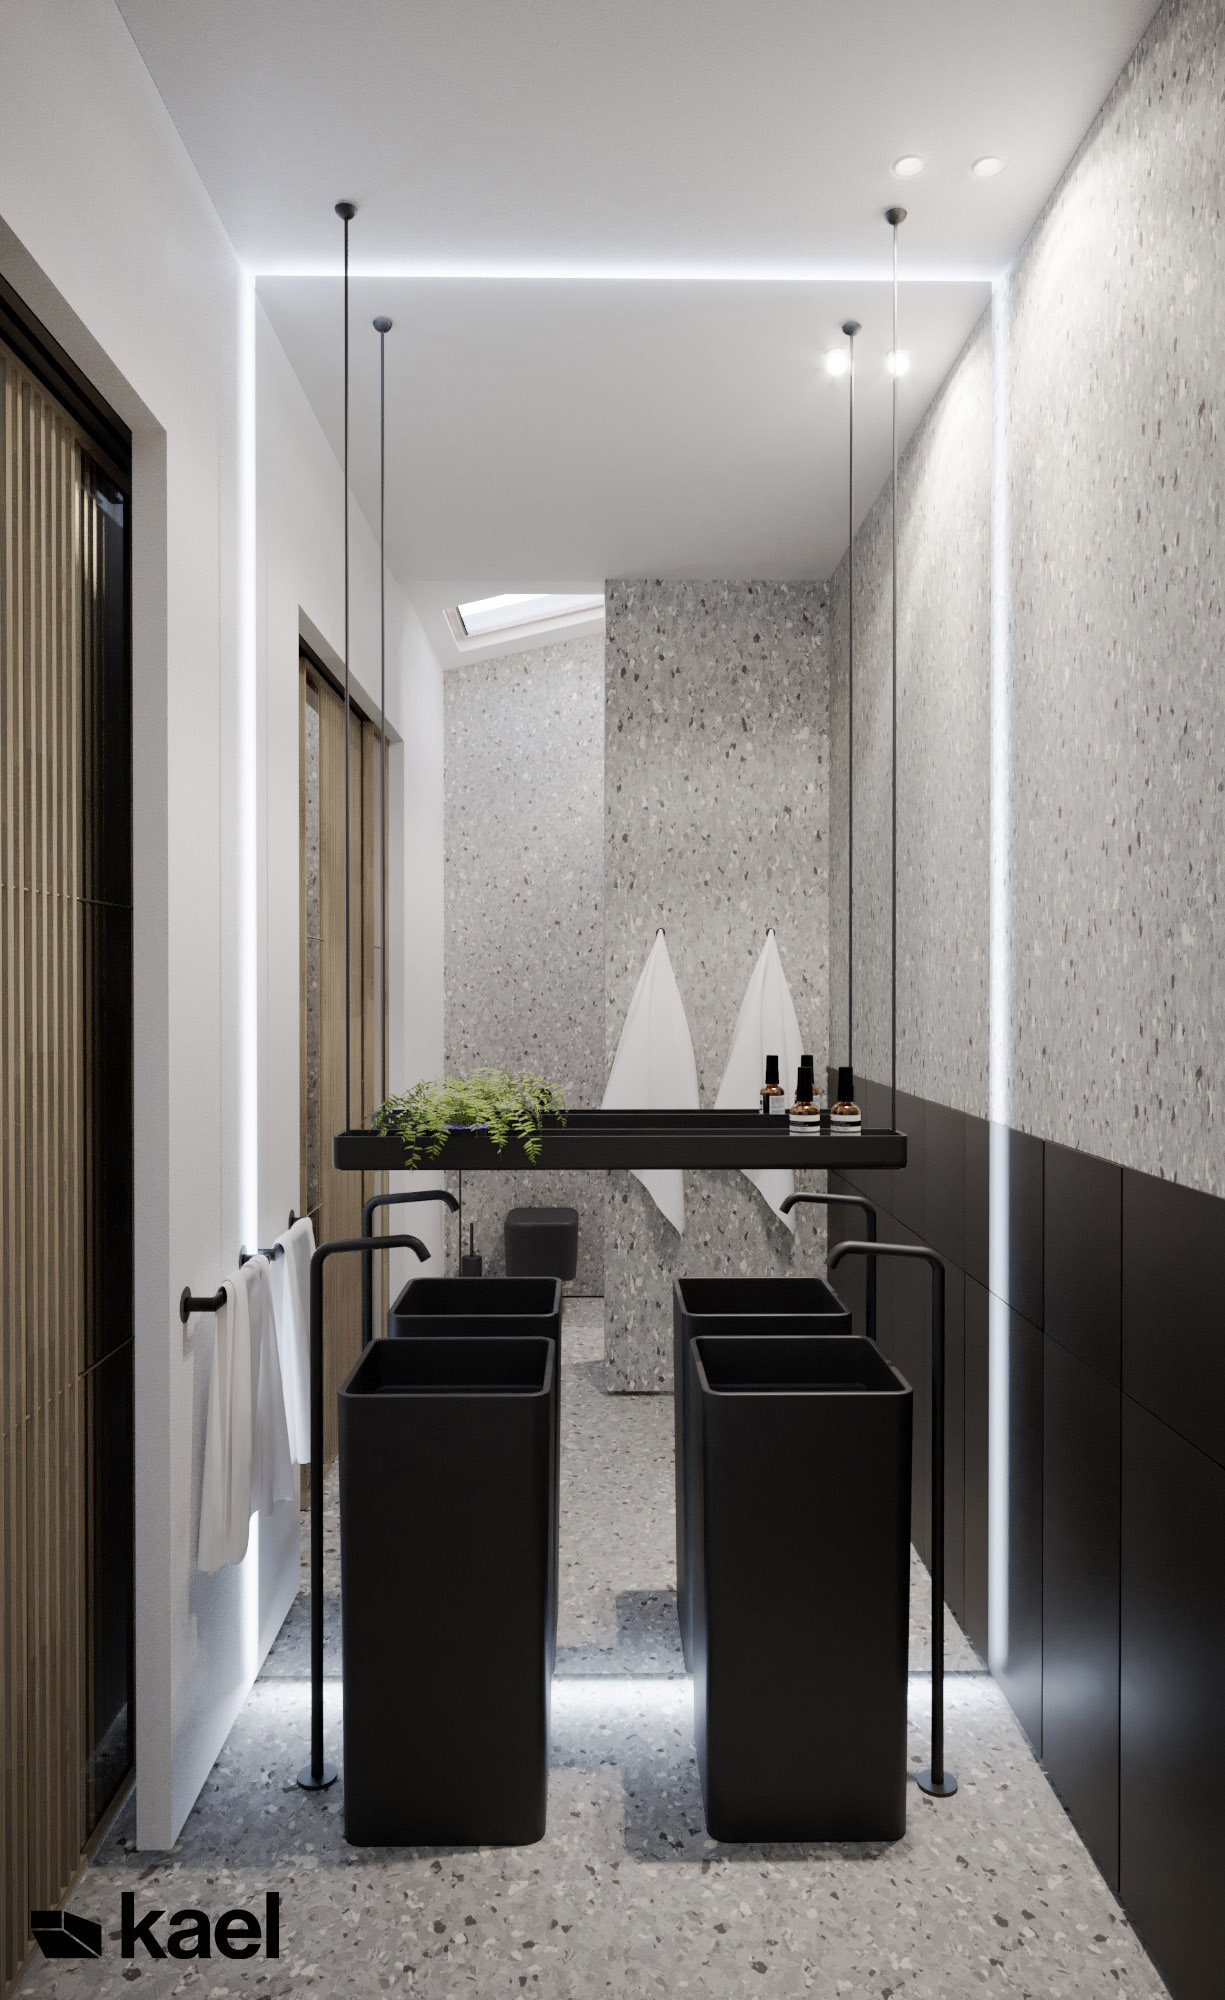 Łazienka - Palestera - projekt wnętrza Kael